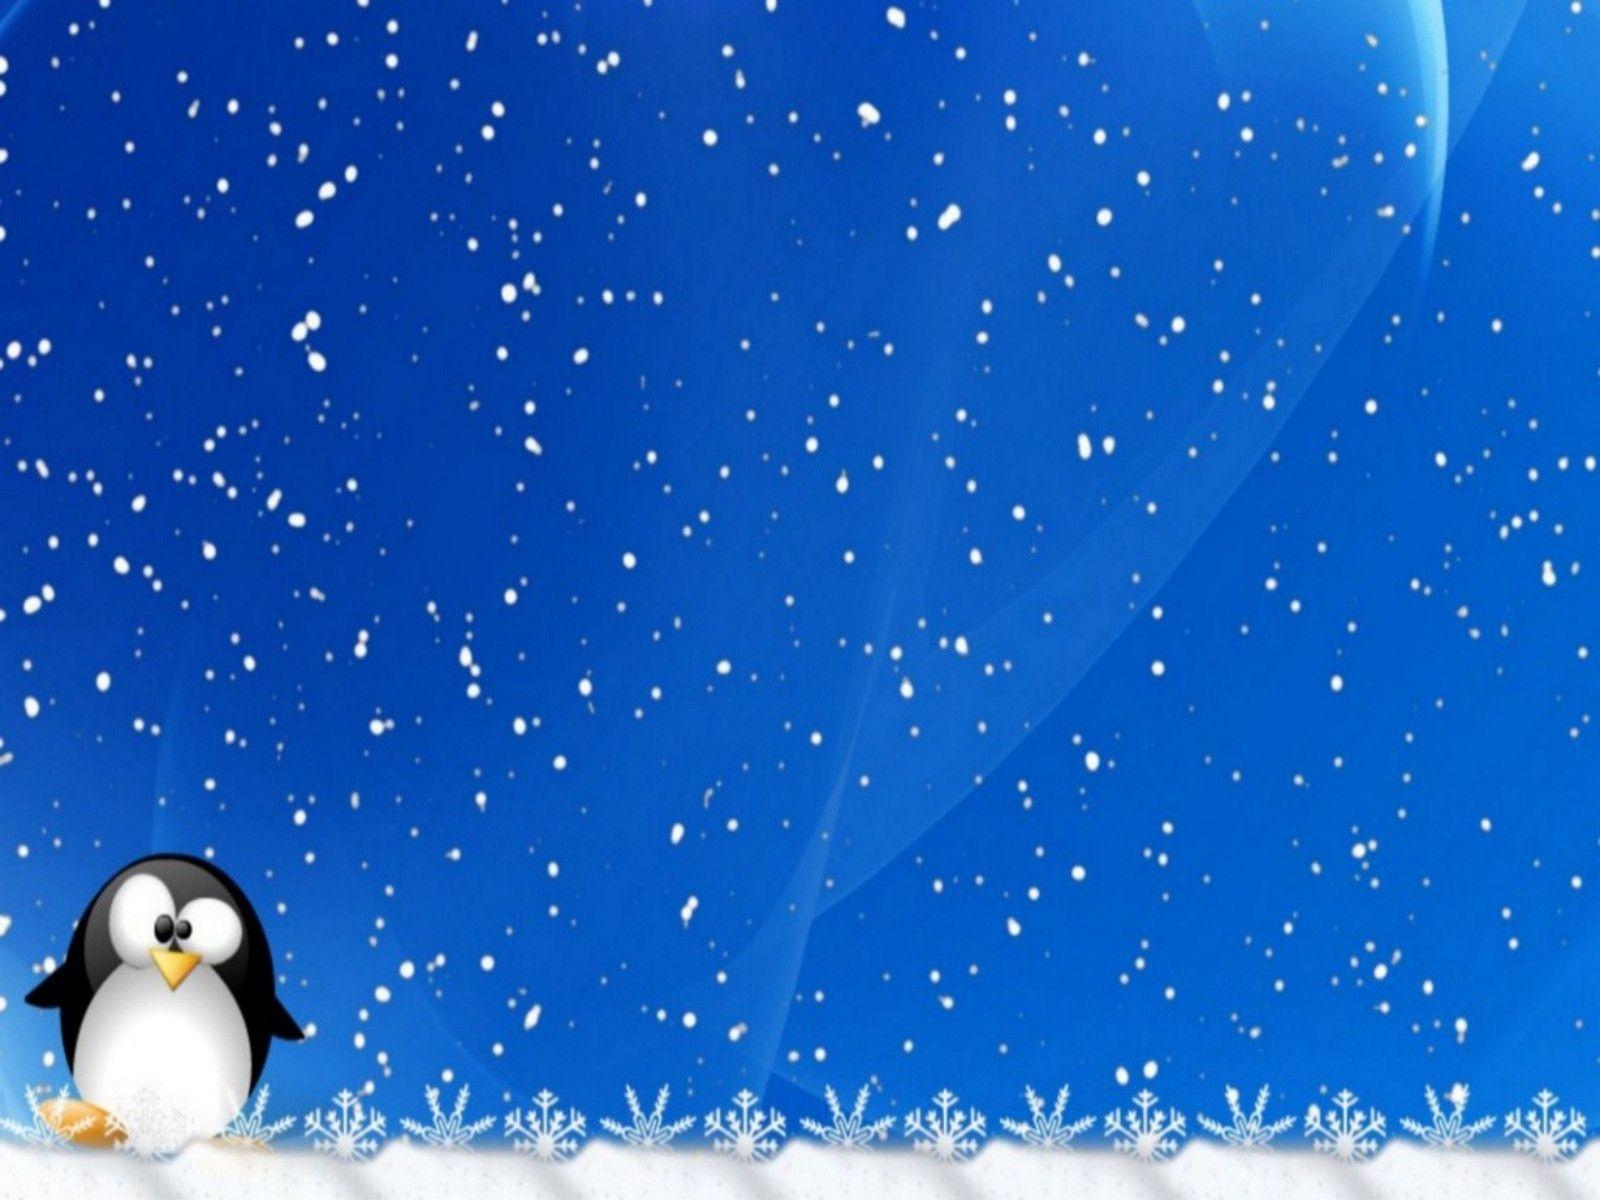 Best Holiday Desktop Wallpapers On Wallpaperdog